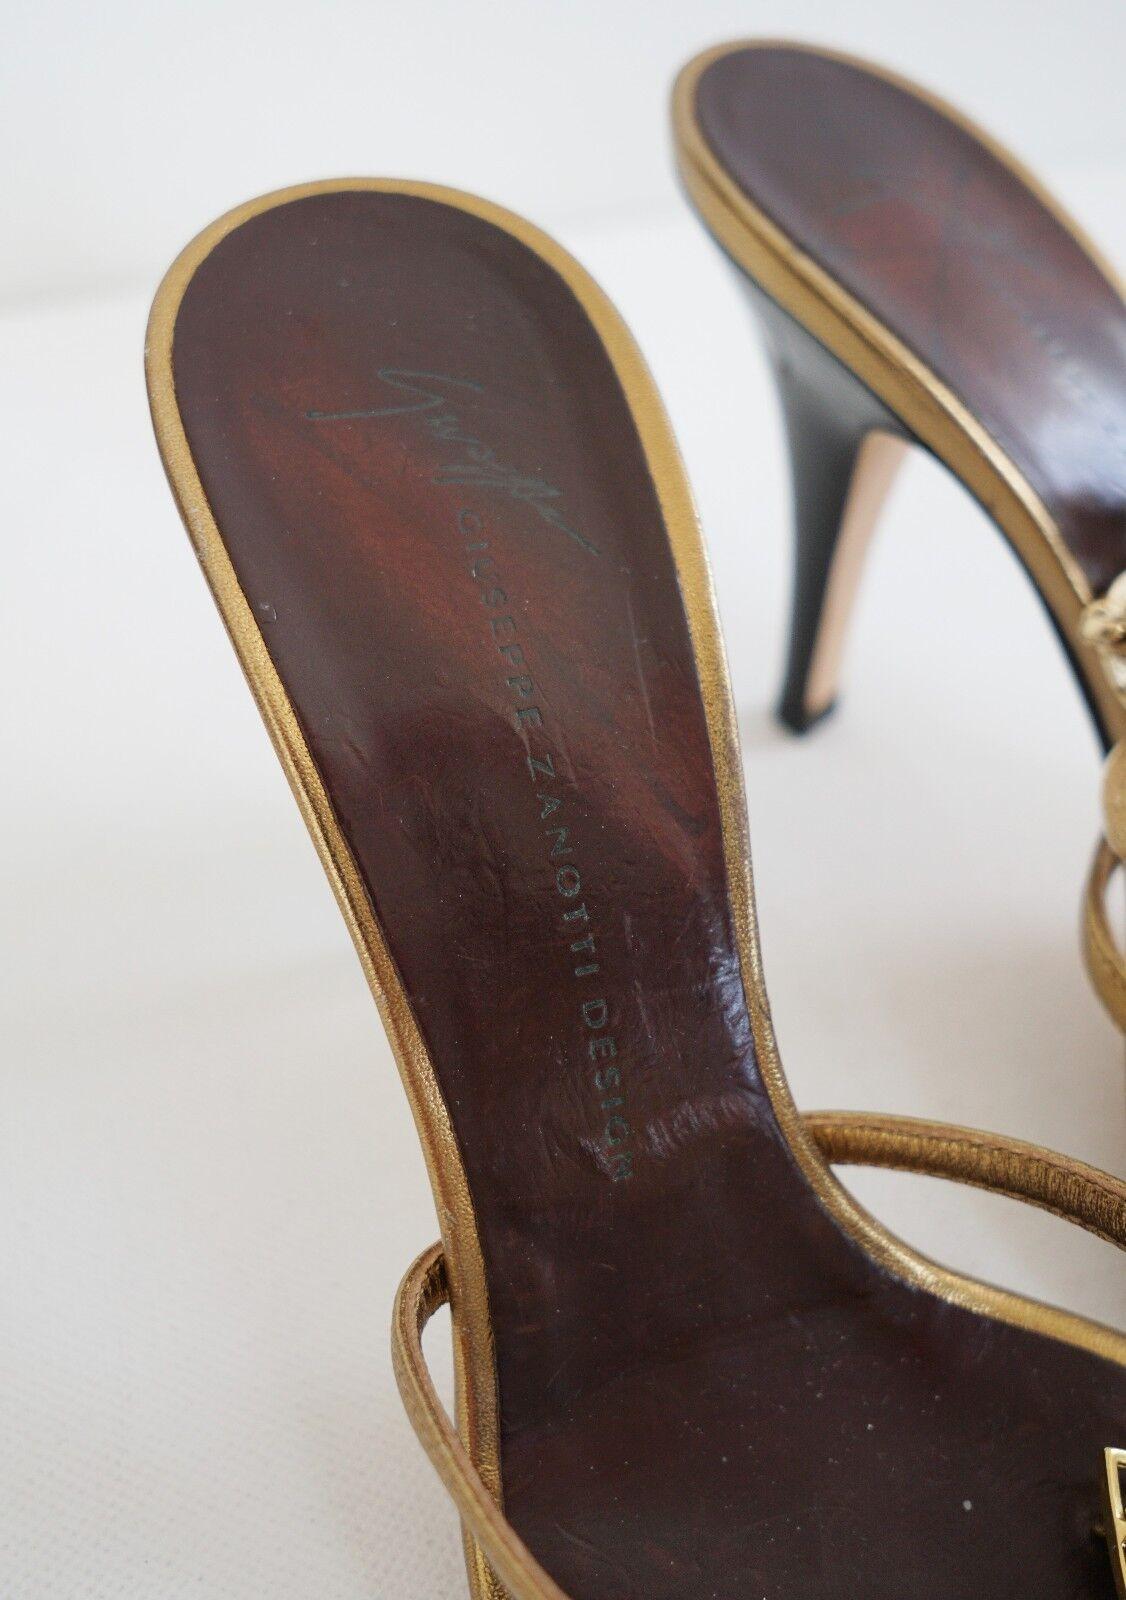 GIUSEPPE ZANOTTI DESIGN Crystal Embellished Strappy Sandals Sandals Sandals 37 US-7 4982a5